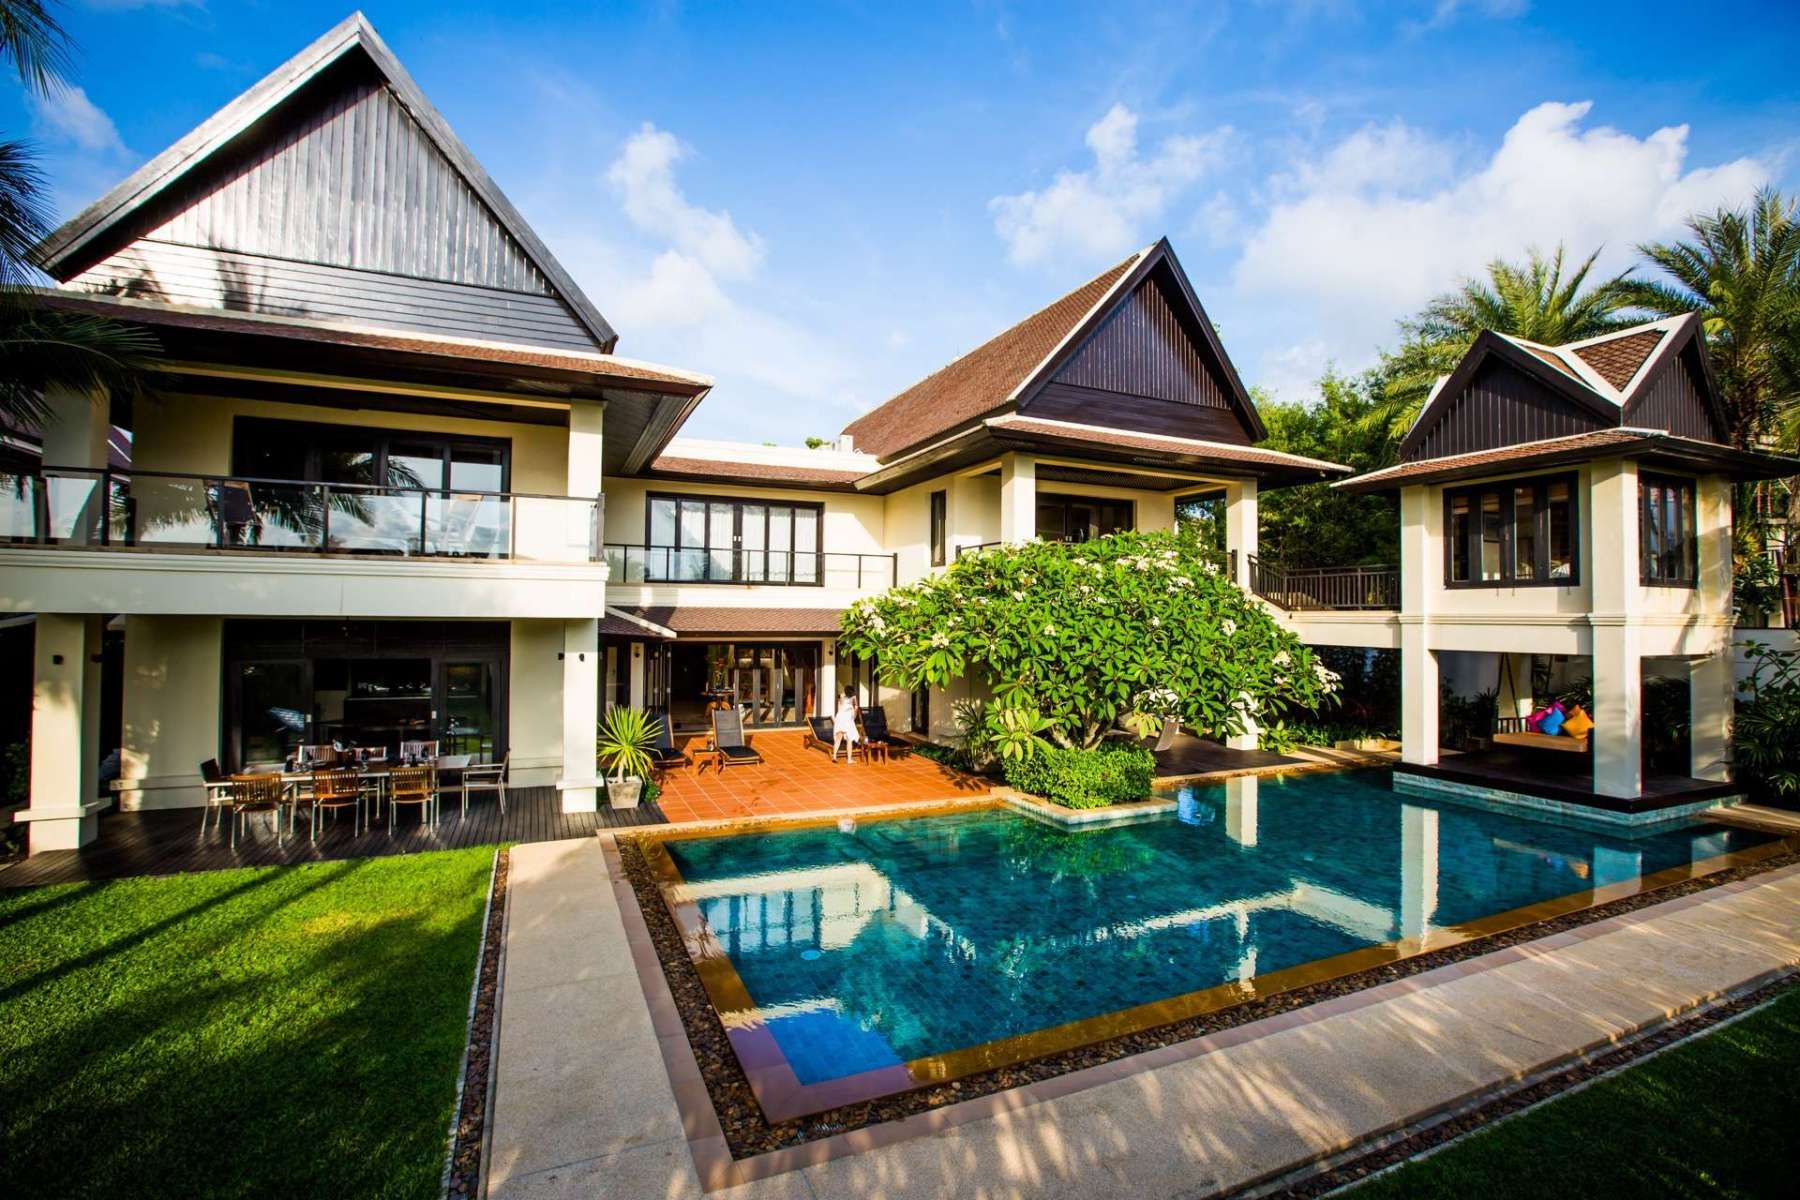 Large-Luxury-Villa-Home-For-Sale-Phuket-Beachfront-Bang-Tao-Thailand-16